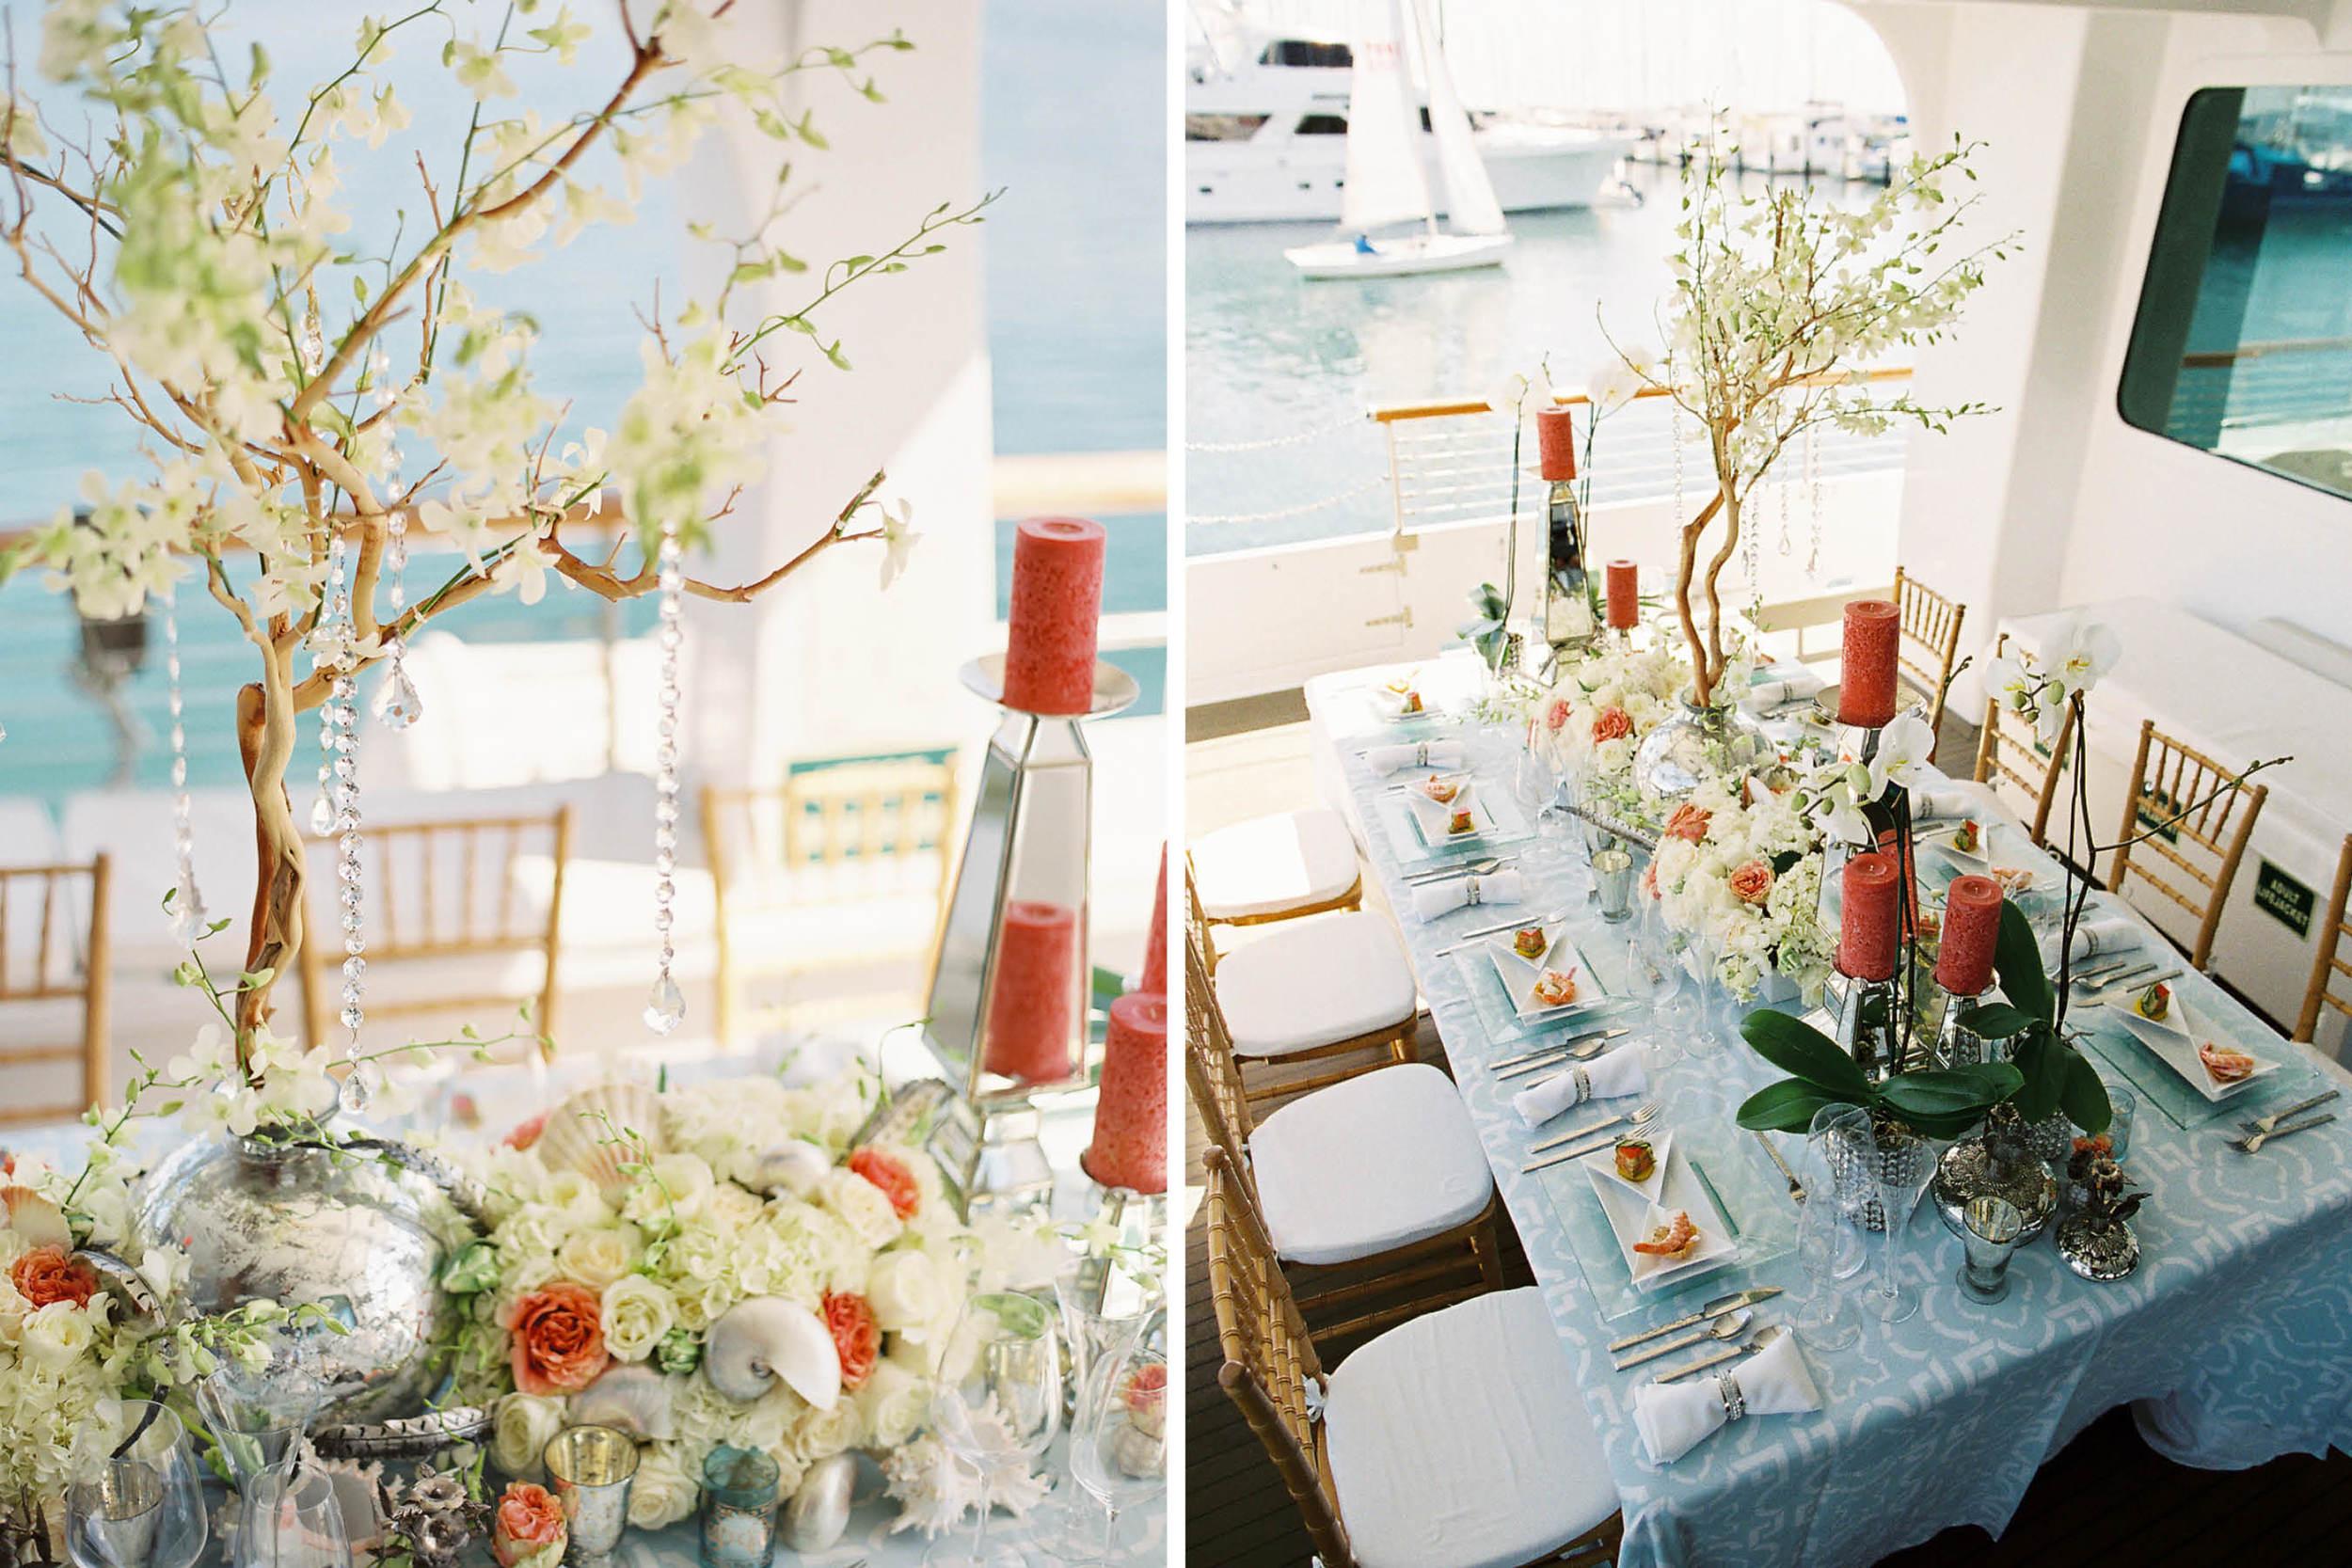 alegria-by-design-wedding-coordinator-planner-santa-barbara-channel-cat-yacht (7).jpg